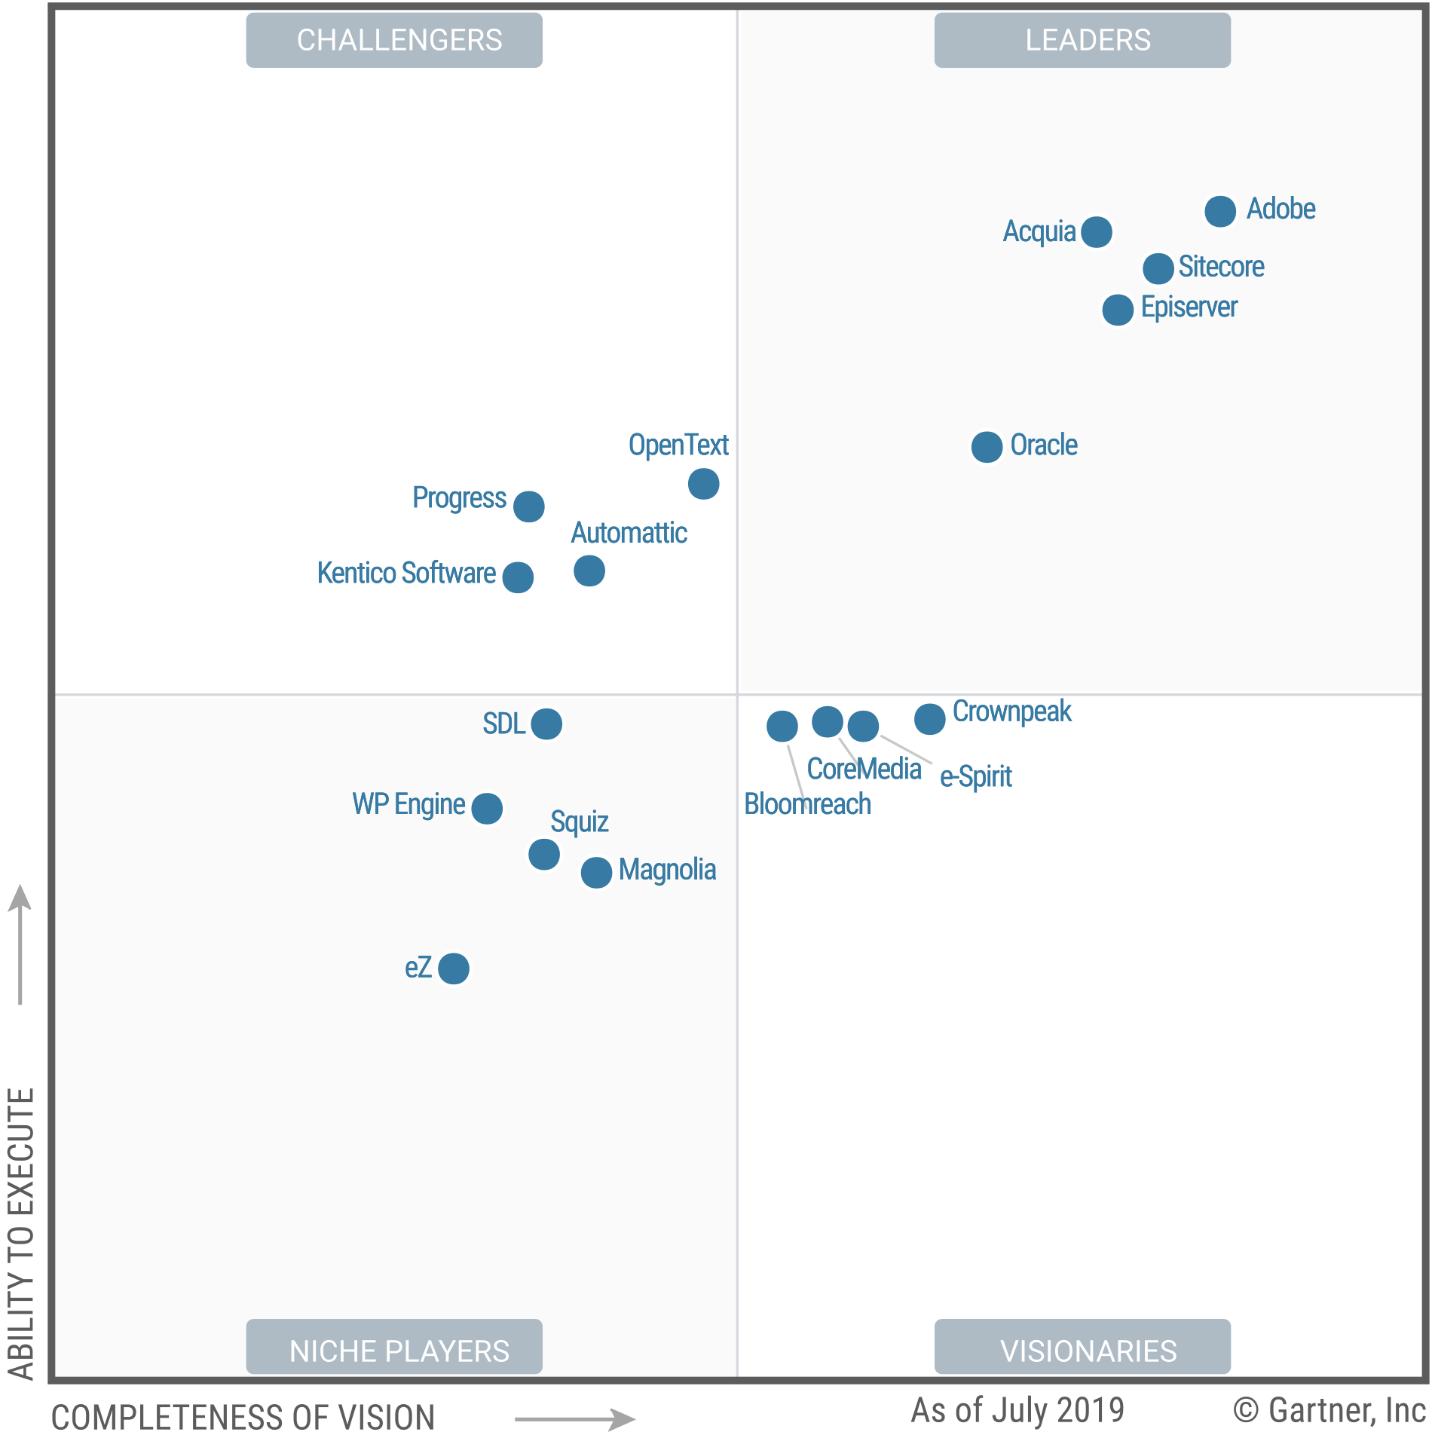 Drupals' Acquia named Leader in Gartner's 2019 Magic Quadrant for Web Content Management